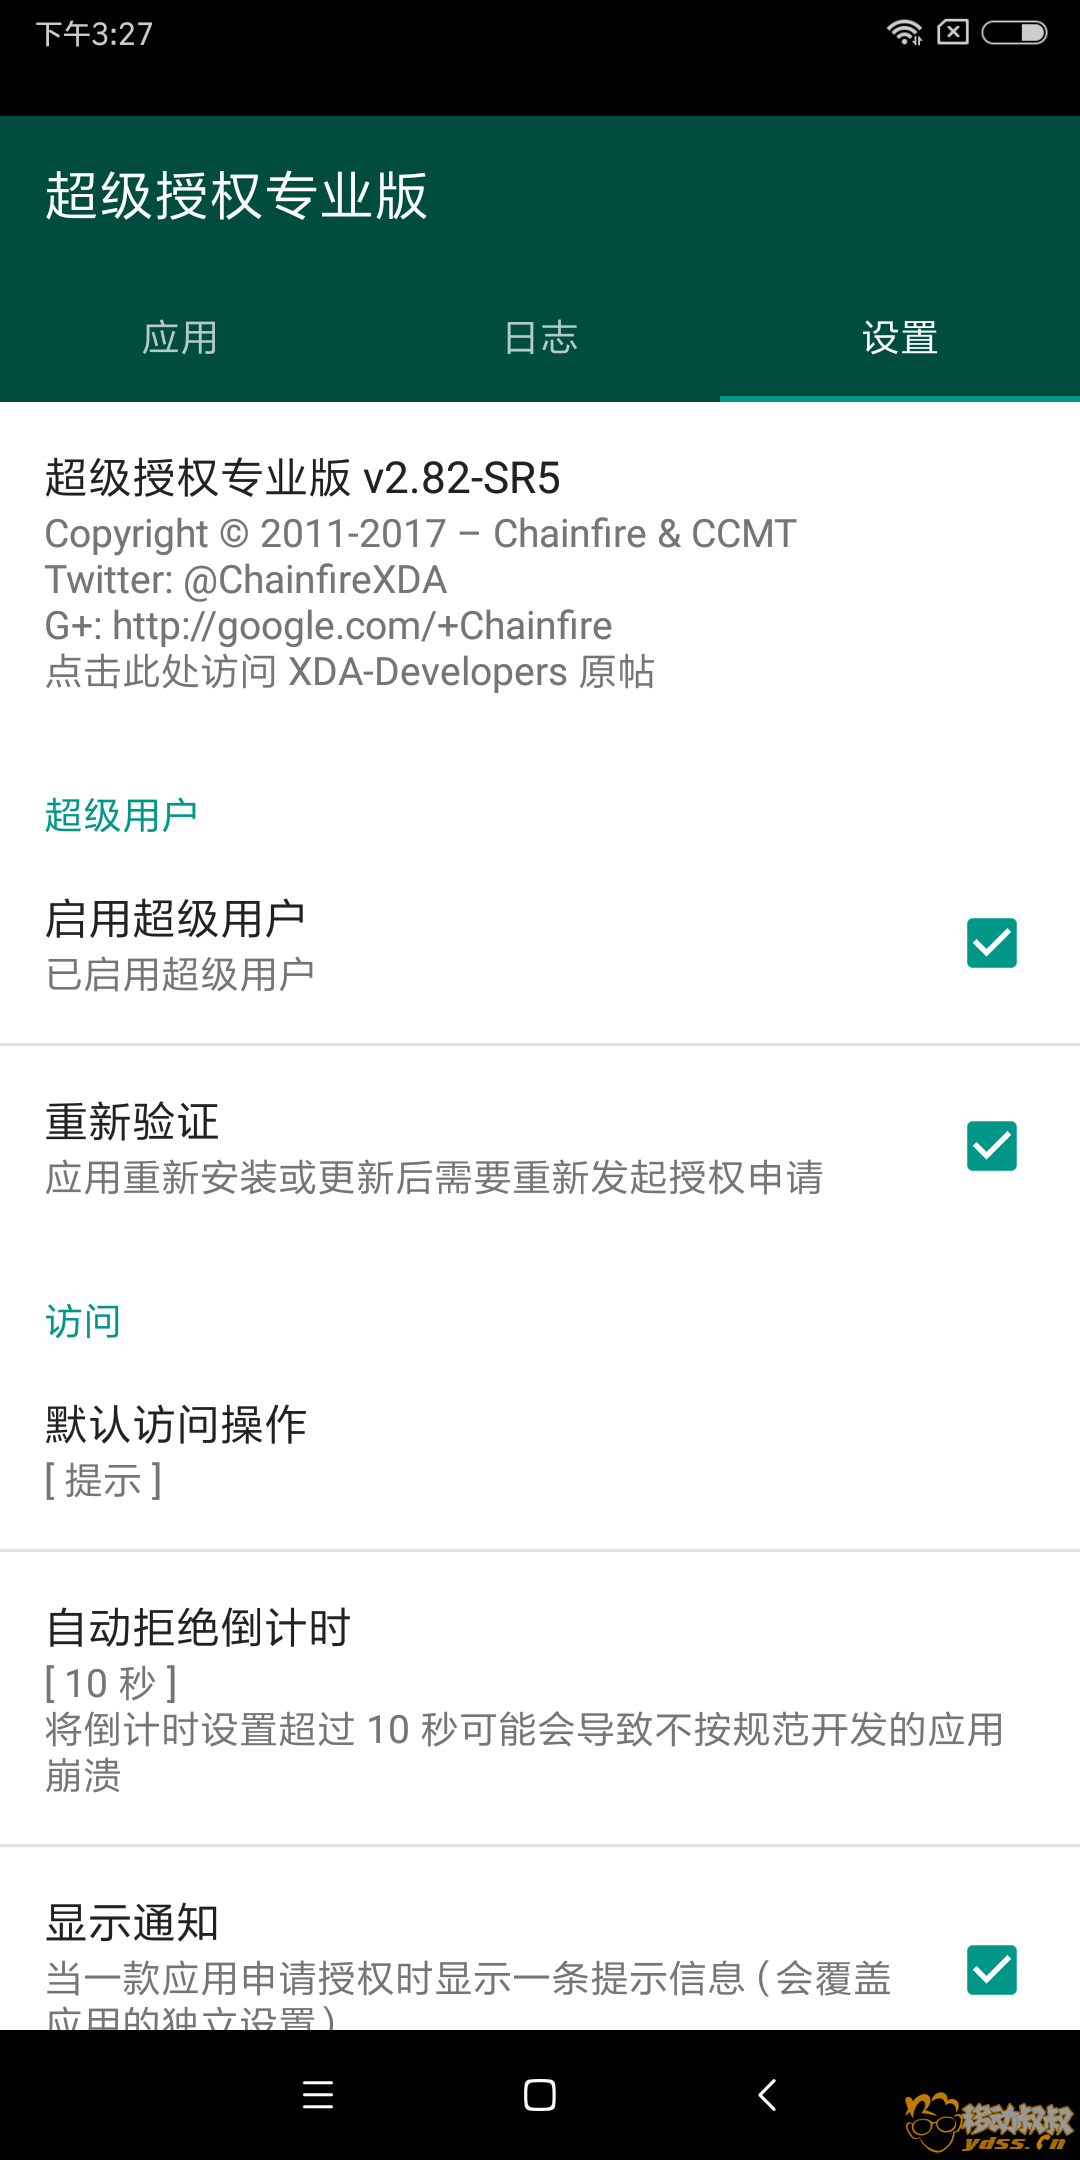 Screenshot_2017-12-27-15-27-07-748_eu.chainfire.supersu.png